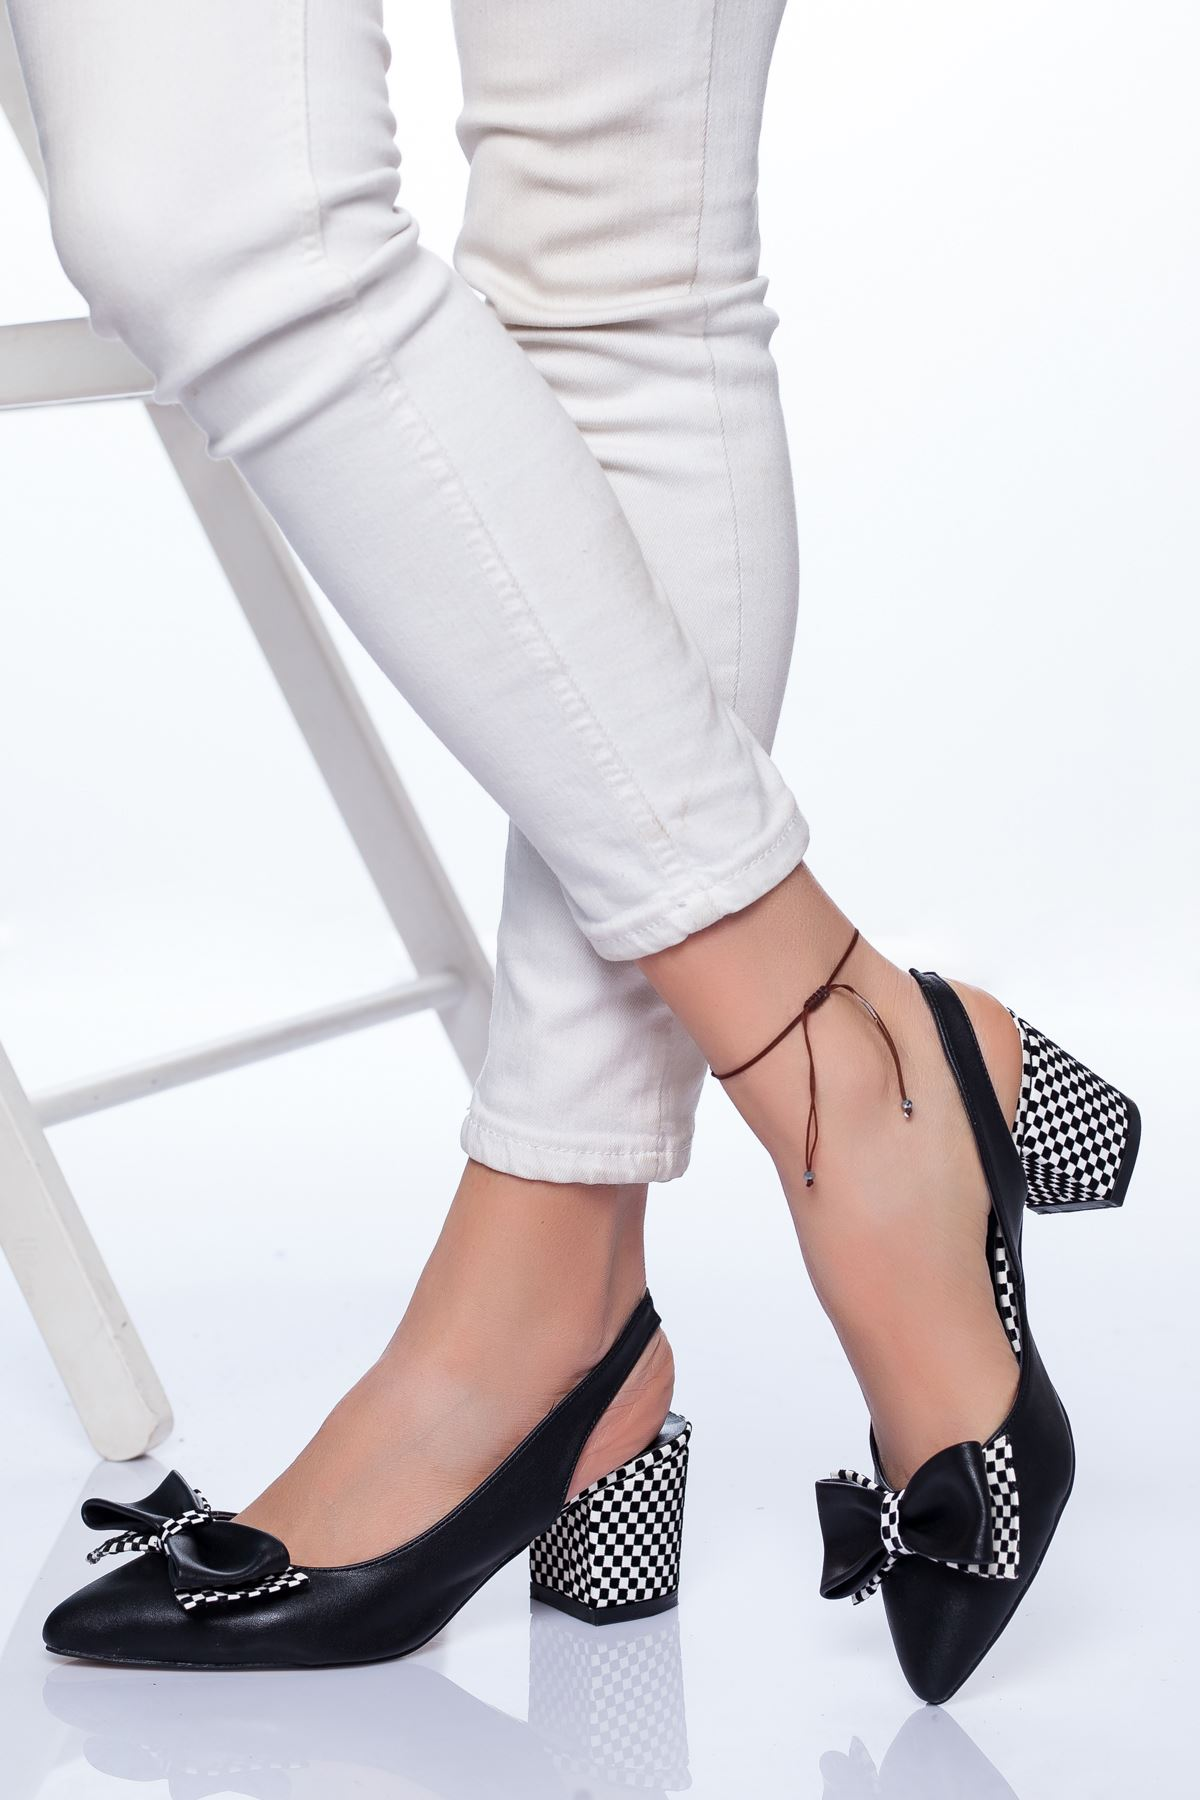 Chano Topuklu Ayakkabı SİYAH CİLT